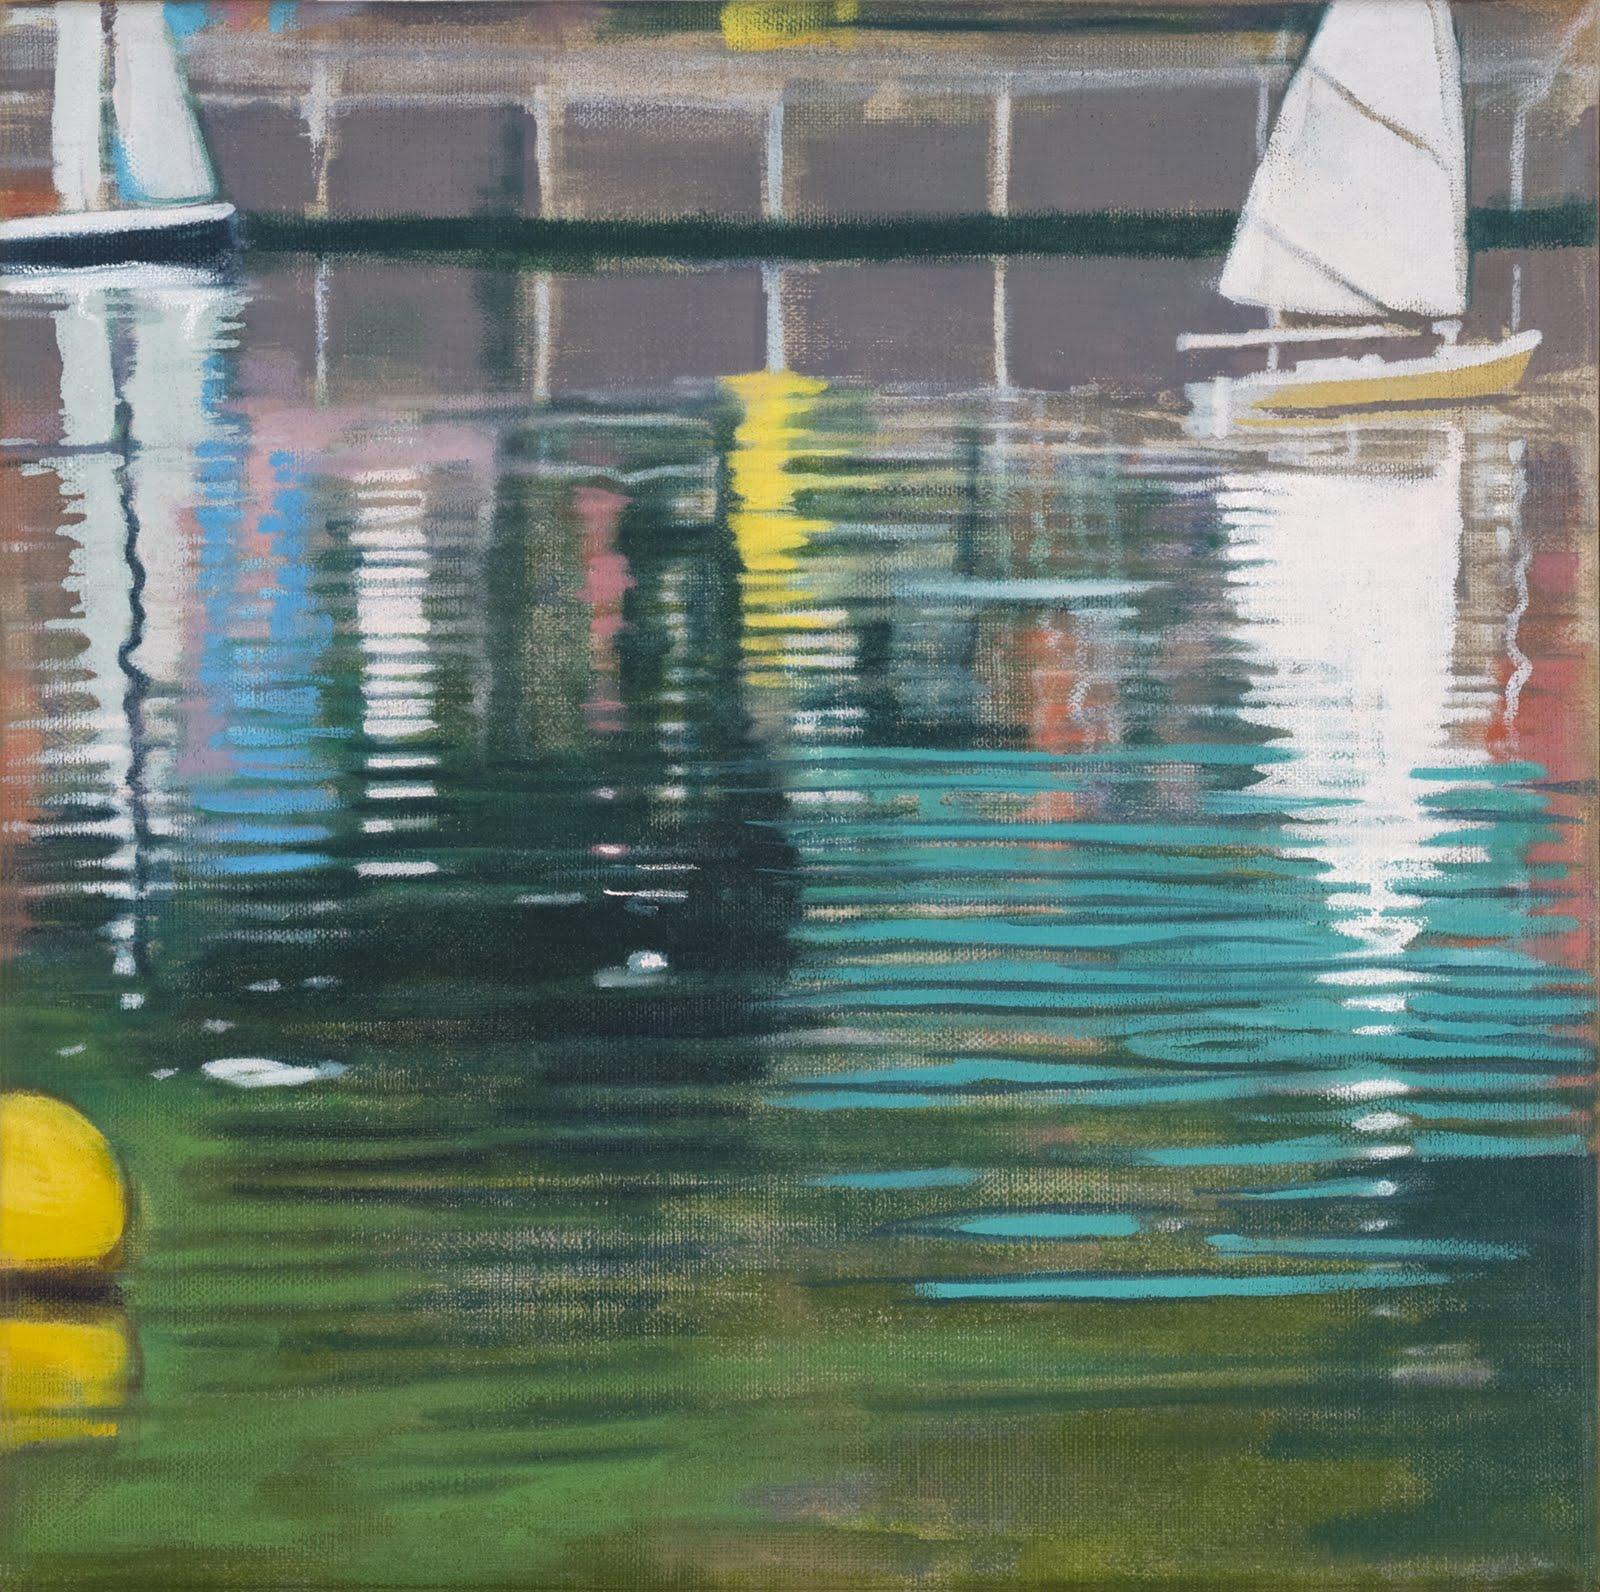 """Model Boats (Central Park)"", oil on linen, 12""x 12"""